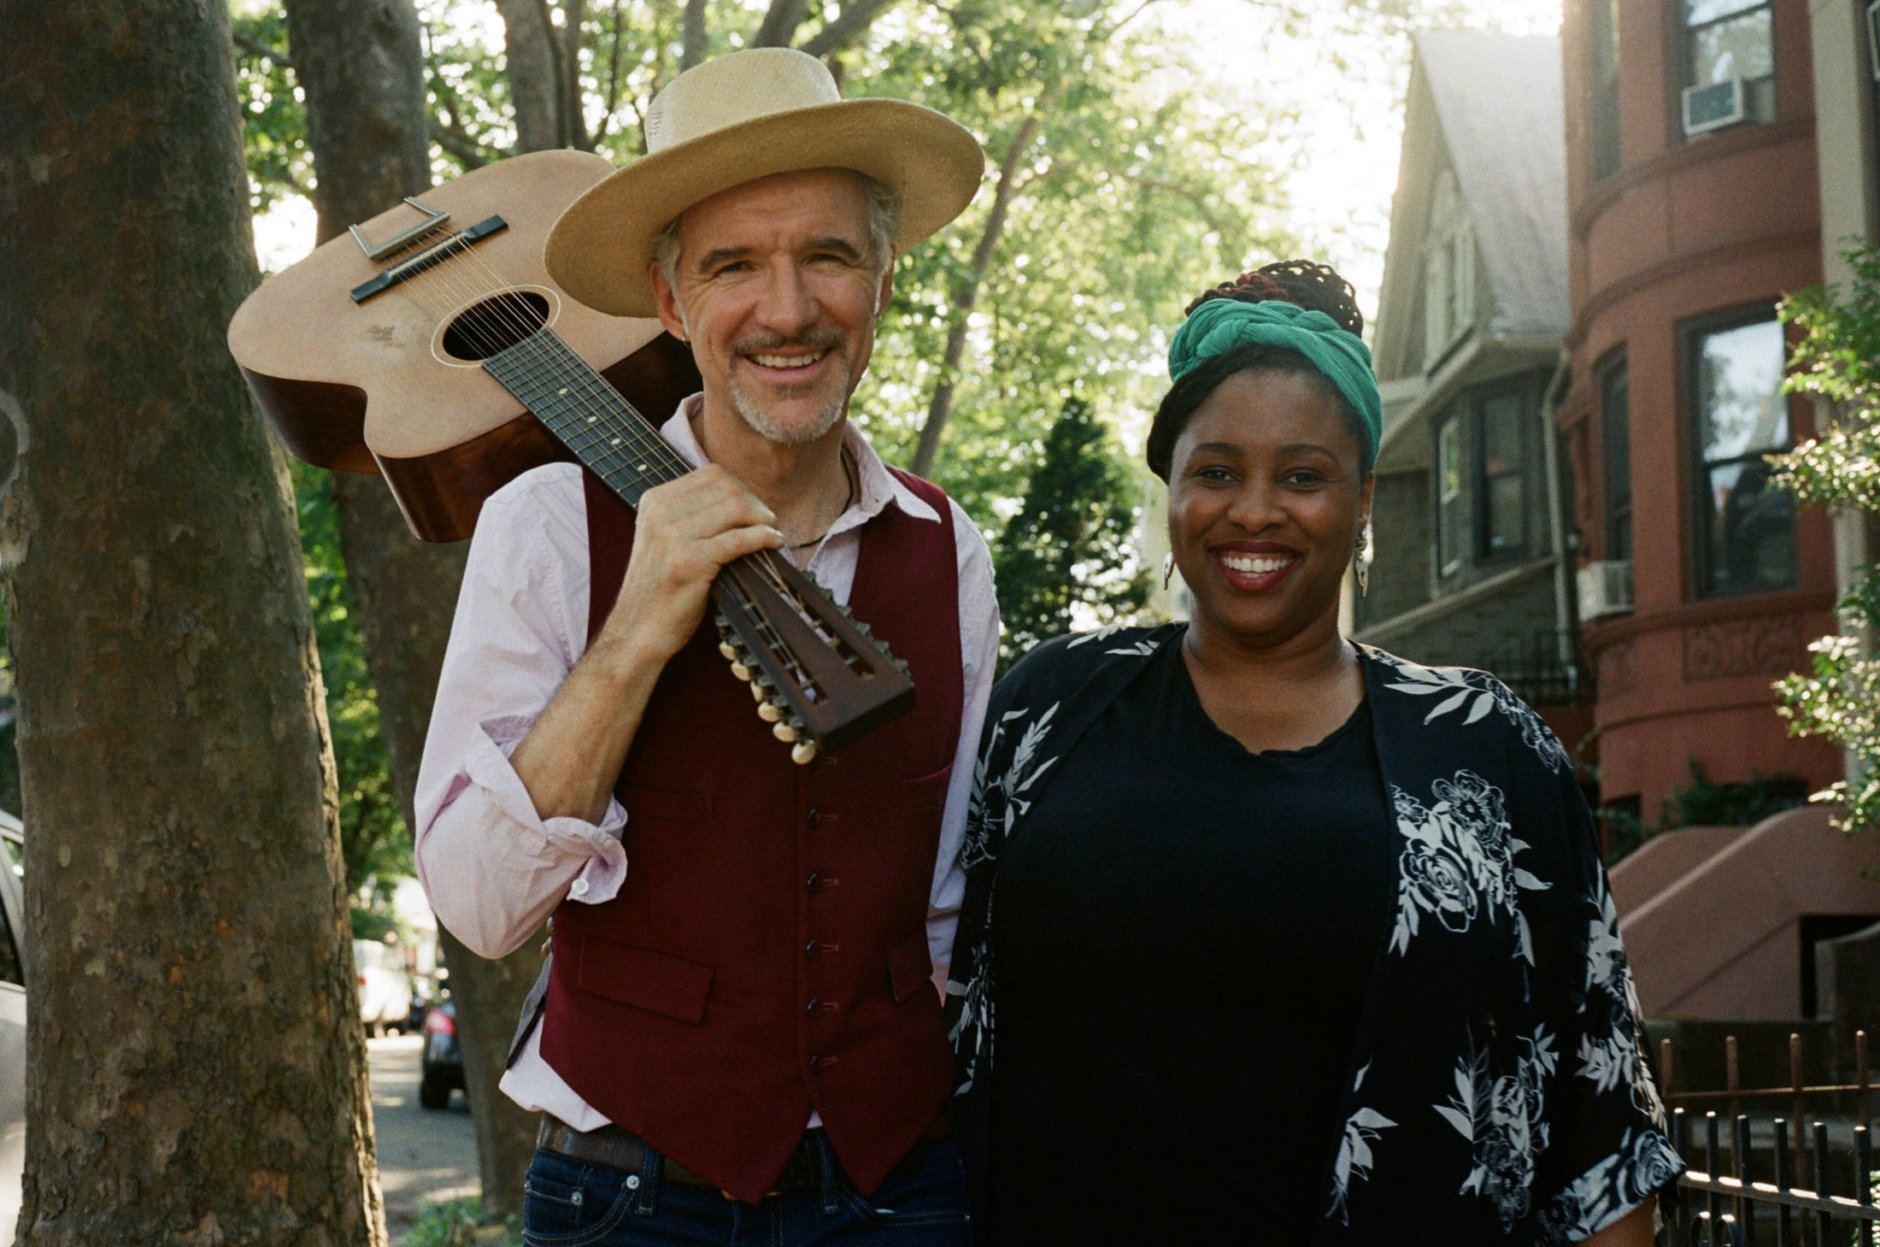 Dan and Claudia Zanes will perform Sunday at the Smithsonian Folklife Festival. (Courtesy Anna Zanes)